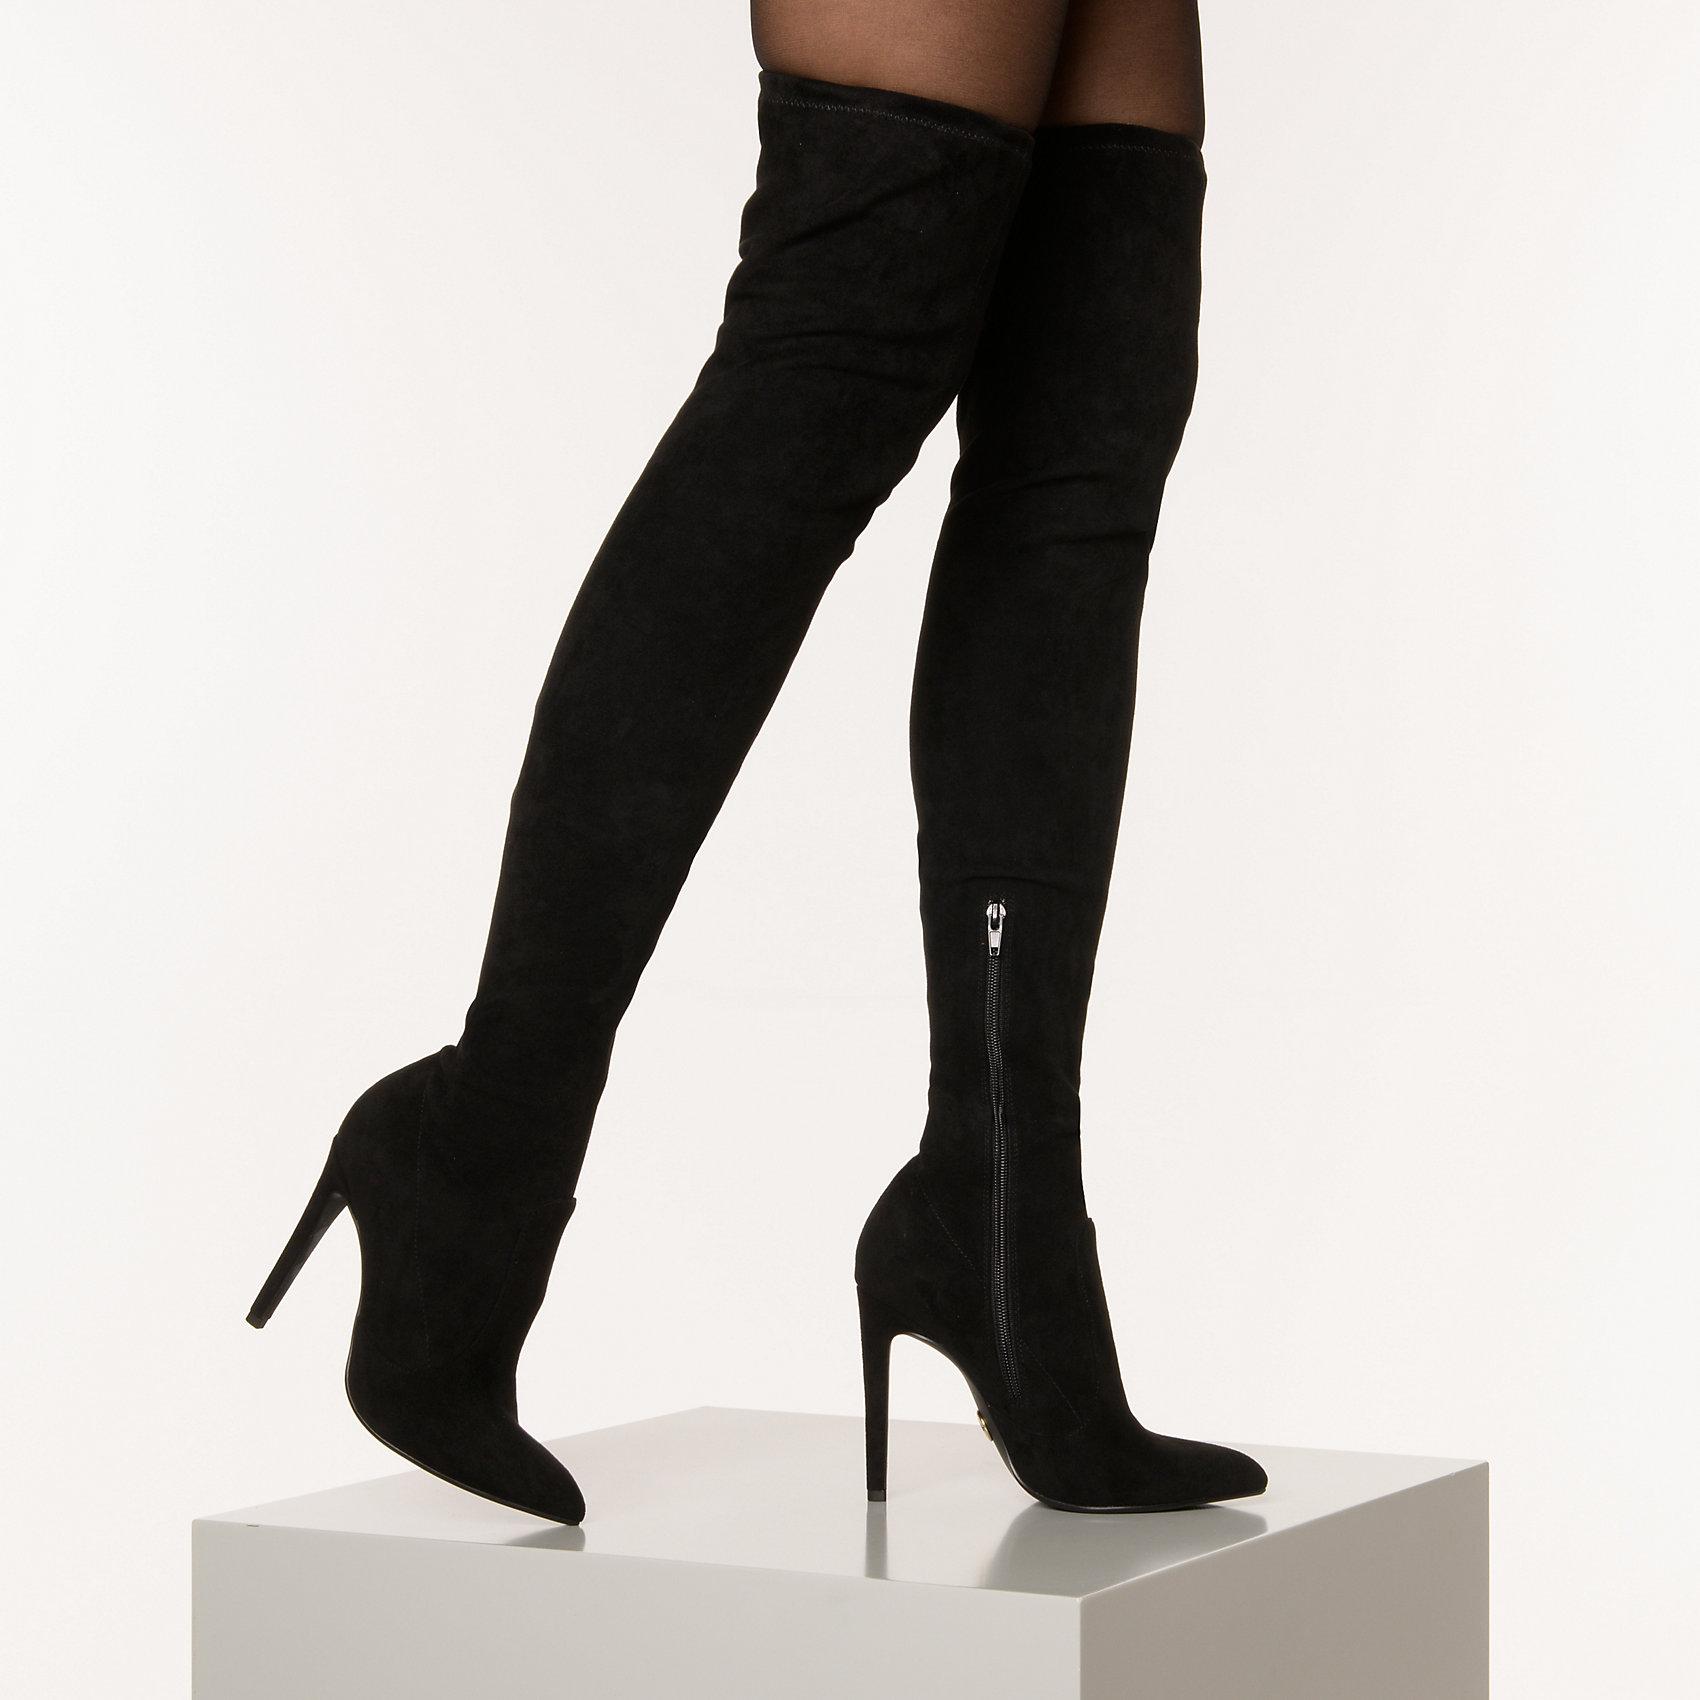 Neu BUFFALO Marjorie Overknee-Stiefel 14876475 für Damen